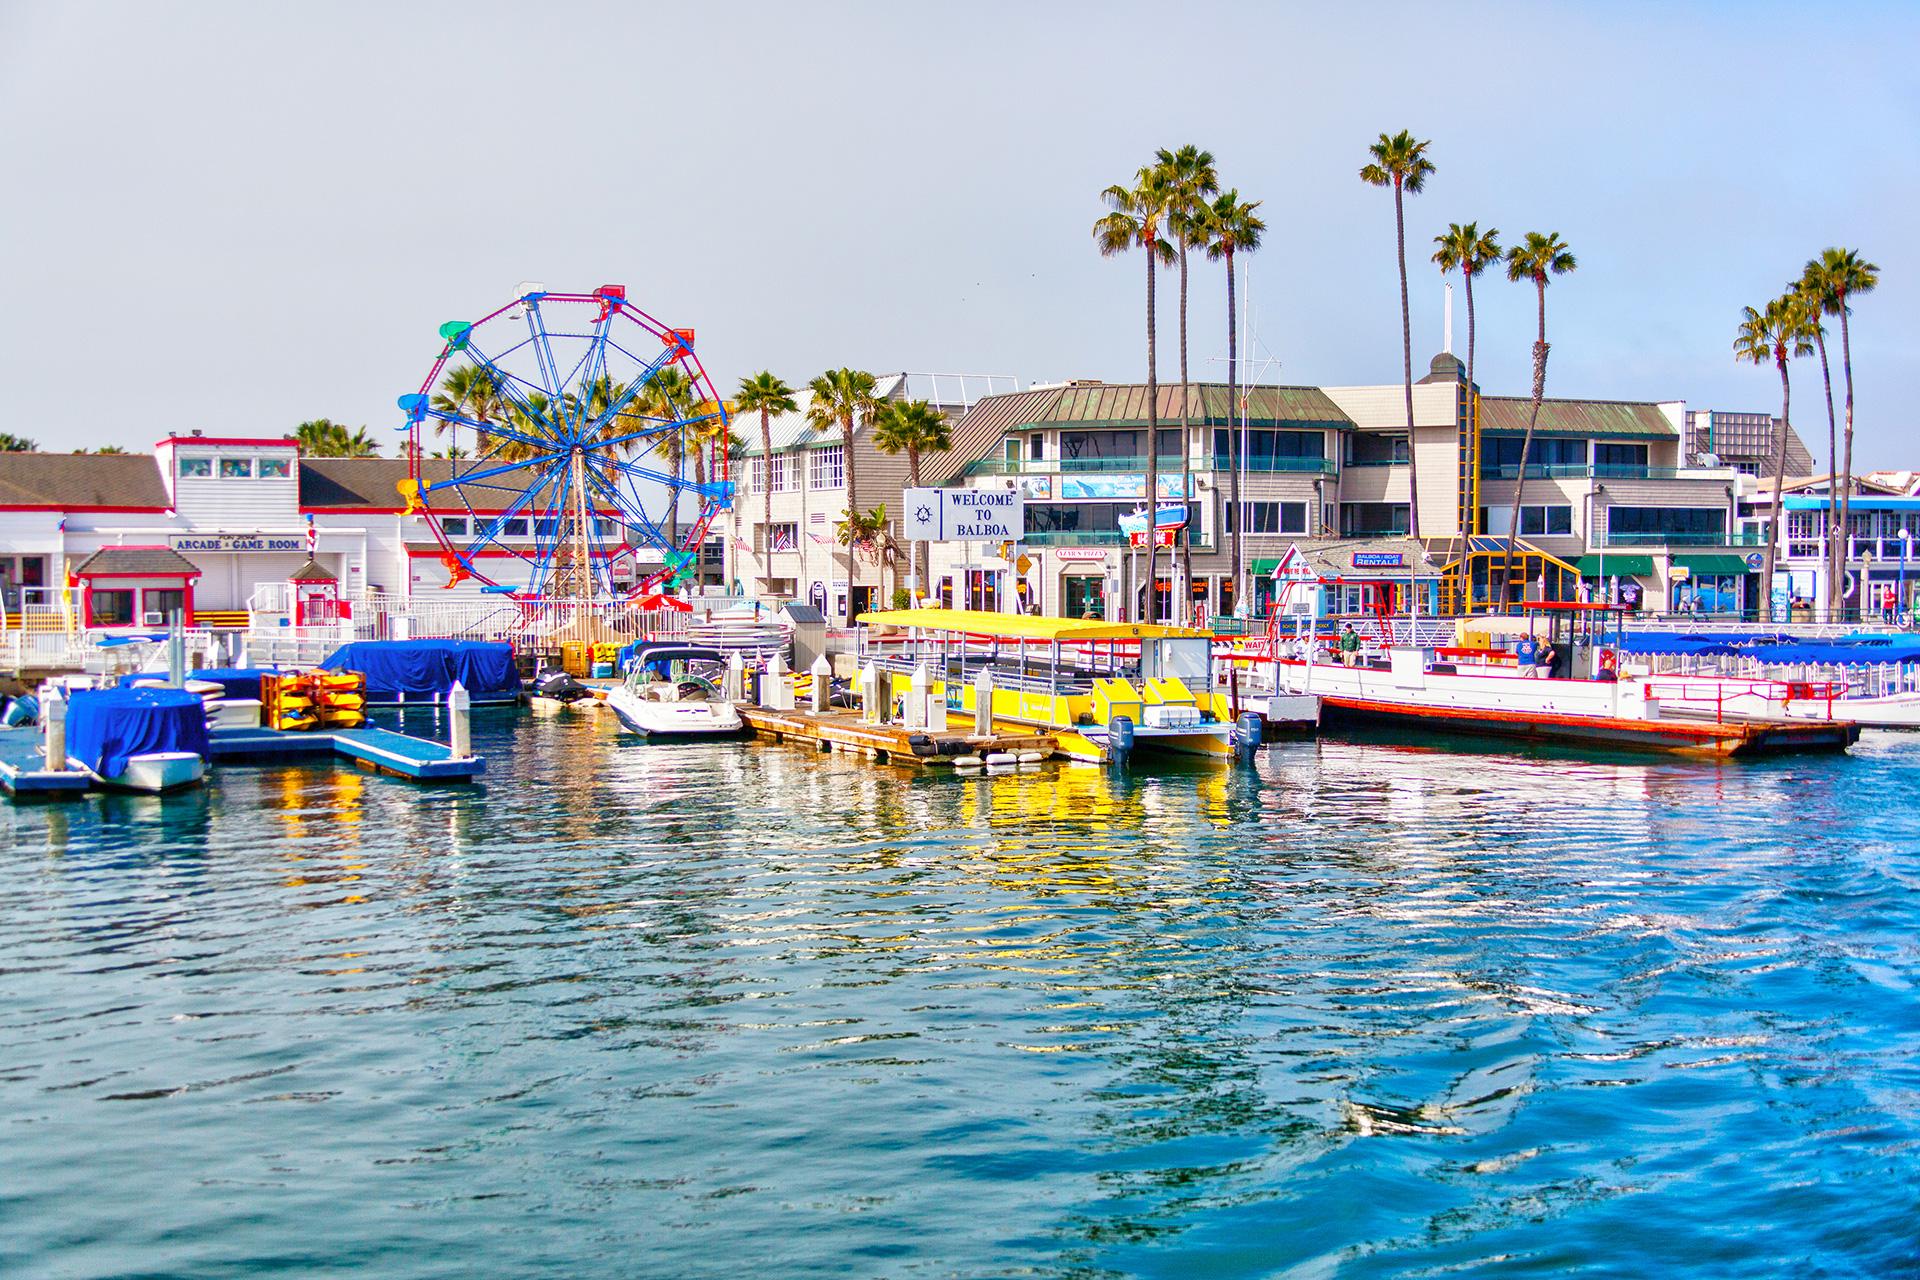 Balboa Beach; Courtesy of Ronnie Chua/Shutterstock